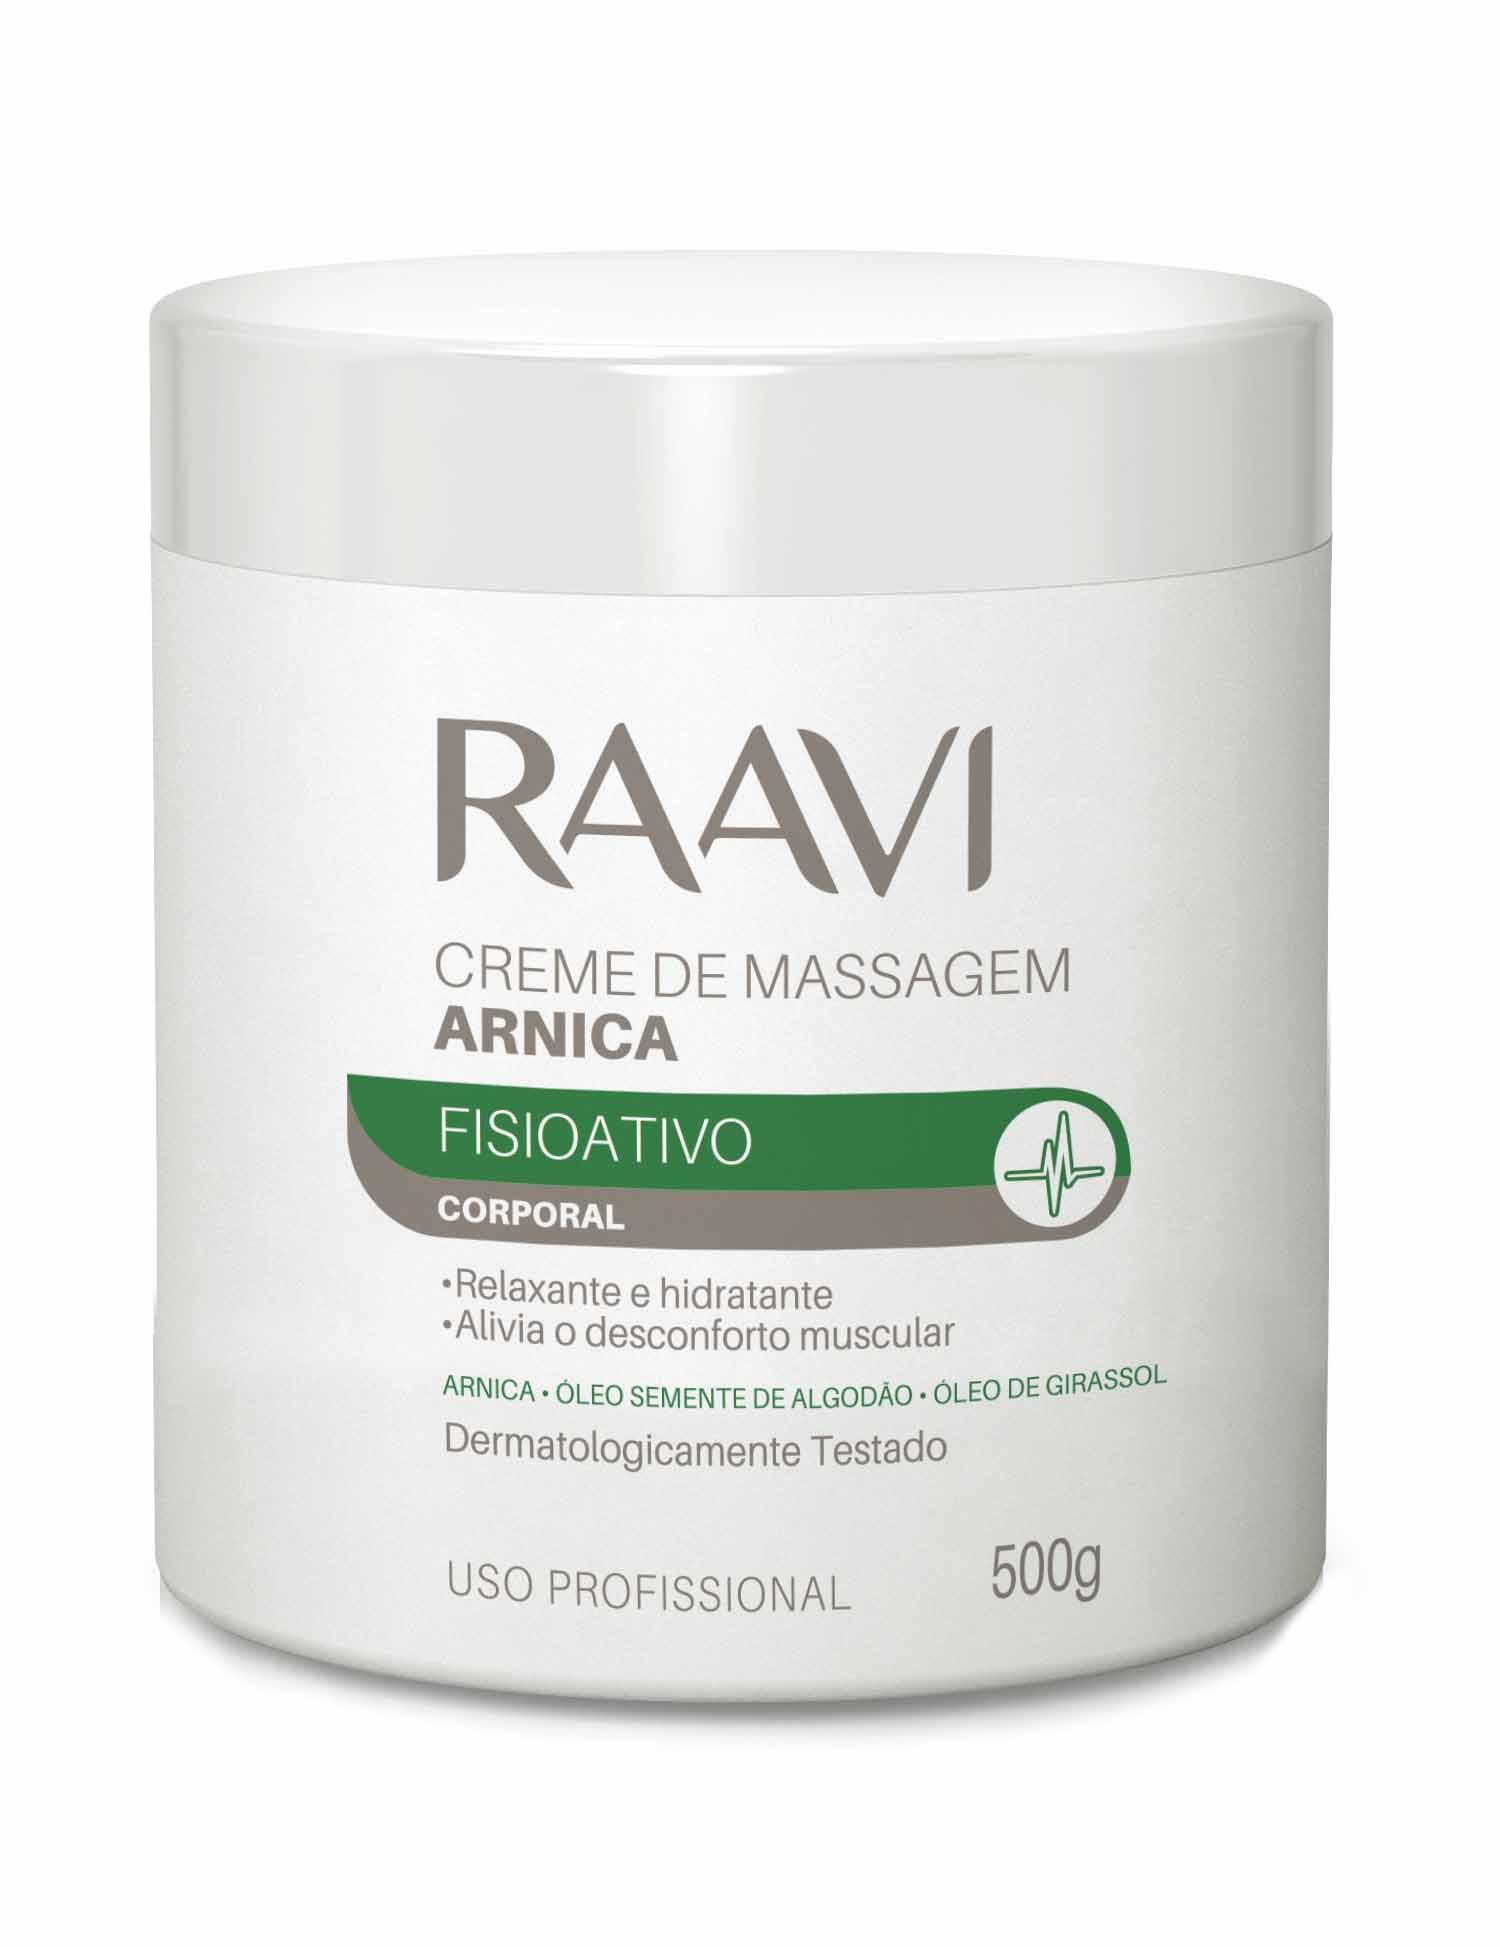 Creme de Massagem Arnica Raavi 500g